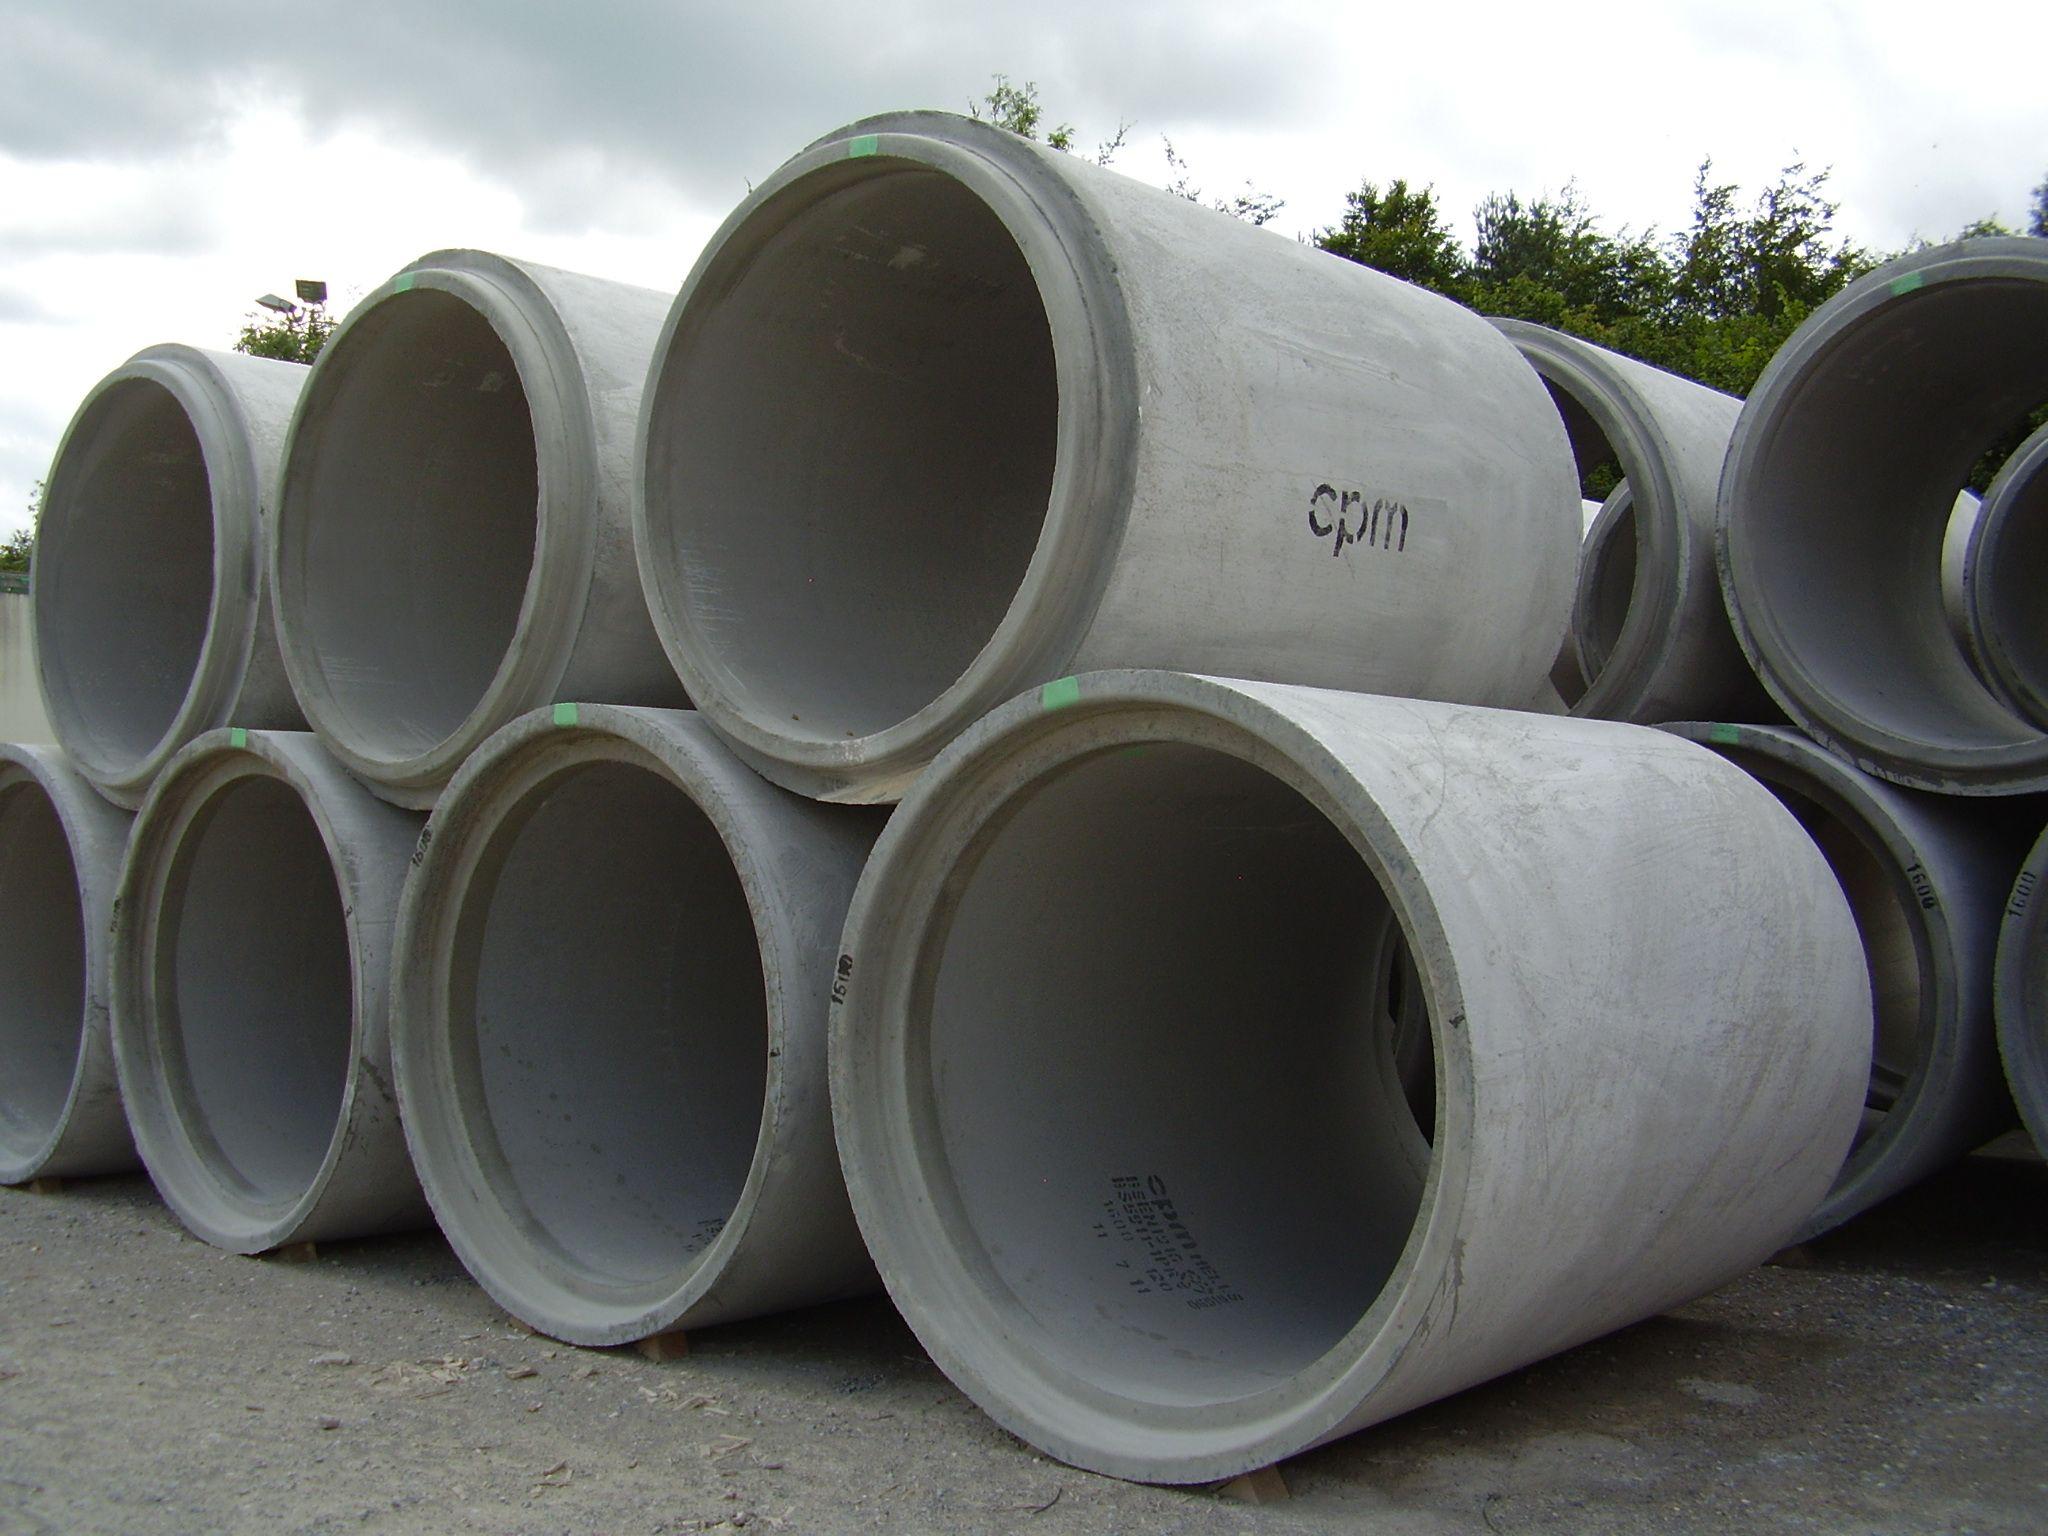 Precast Concrete Pipes : Cpm manufacture pipes made from precast concrete